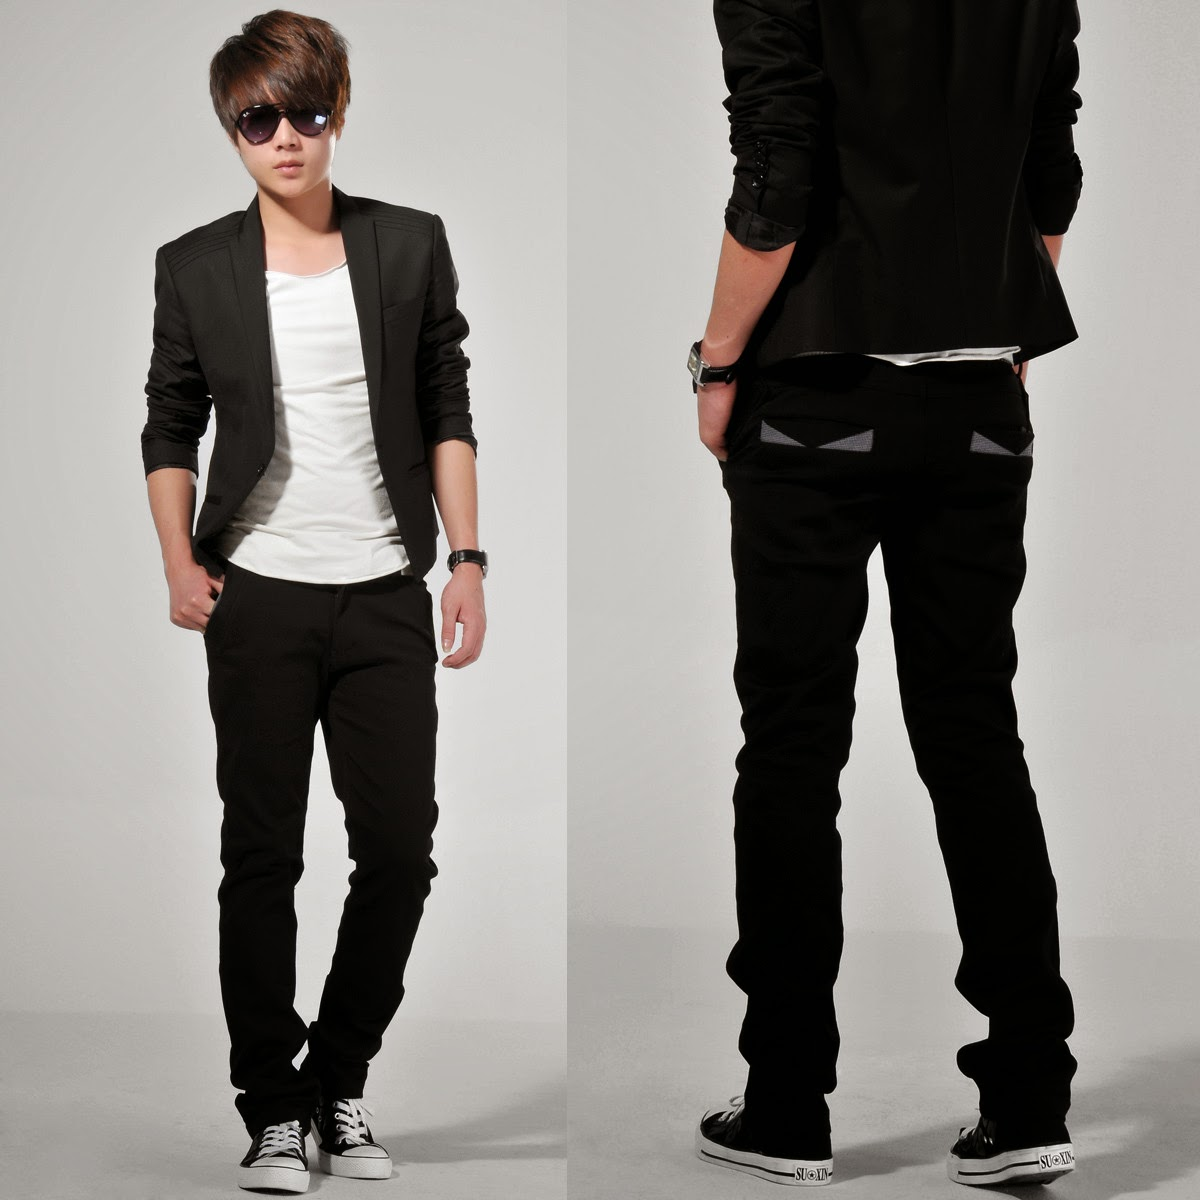 5 Model baju santai korea pria terbaru